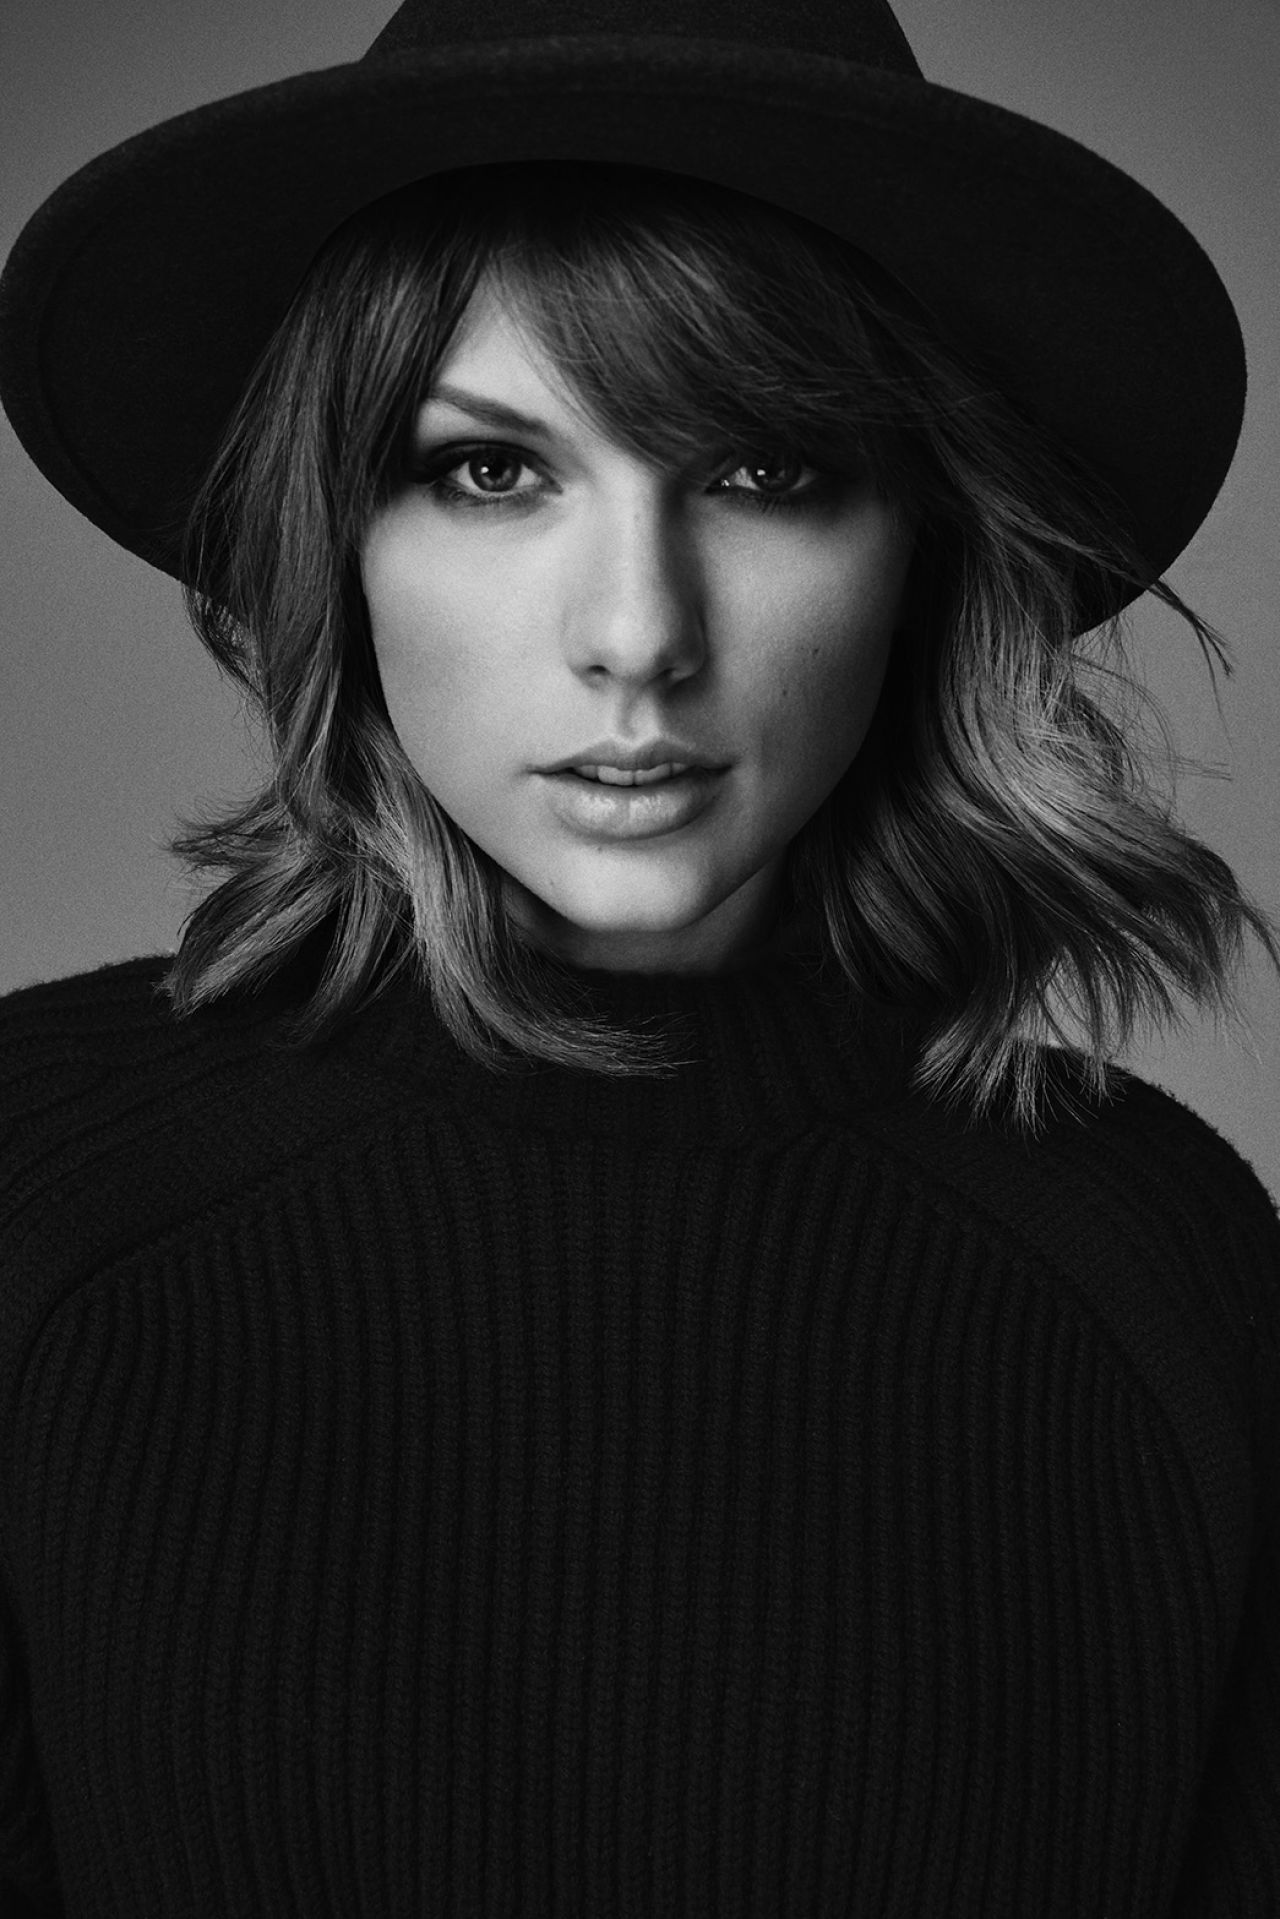 Taylor Swift – Grazia Magazine (France) Photoshoot (2014) Taylor Swift